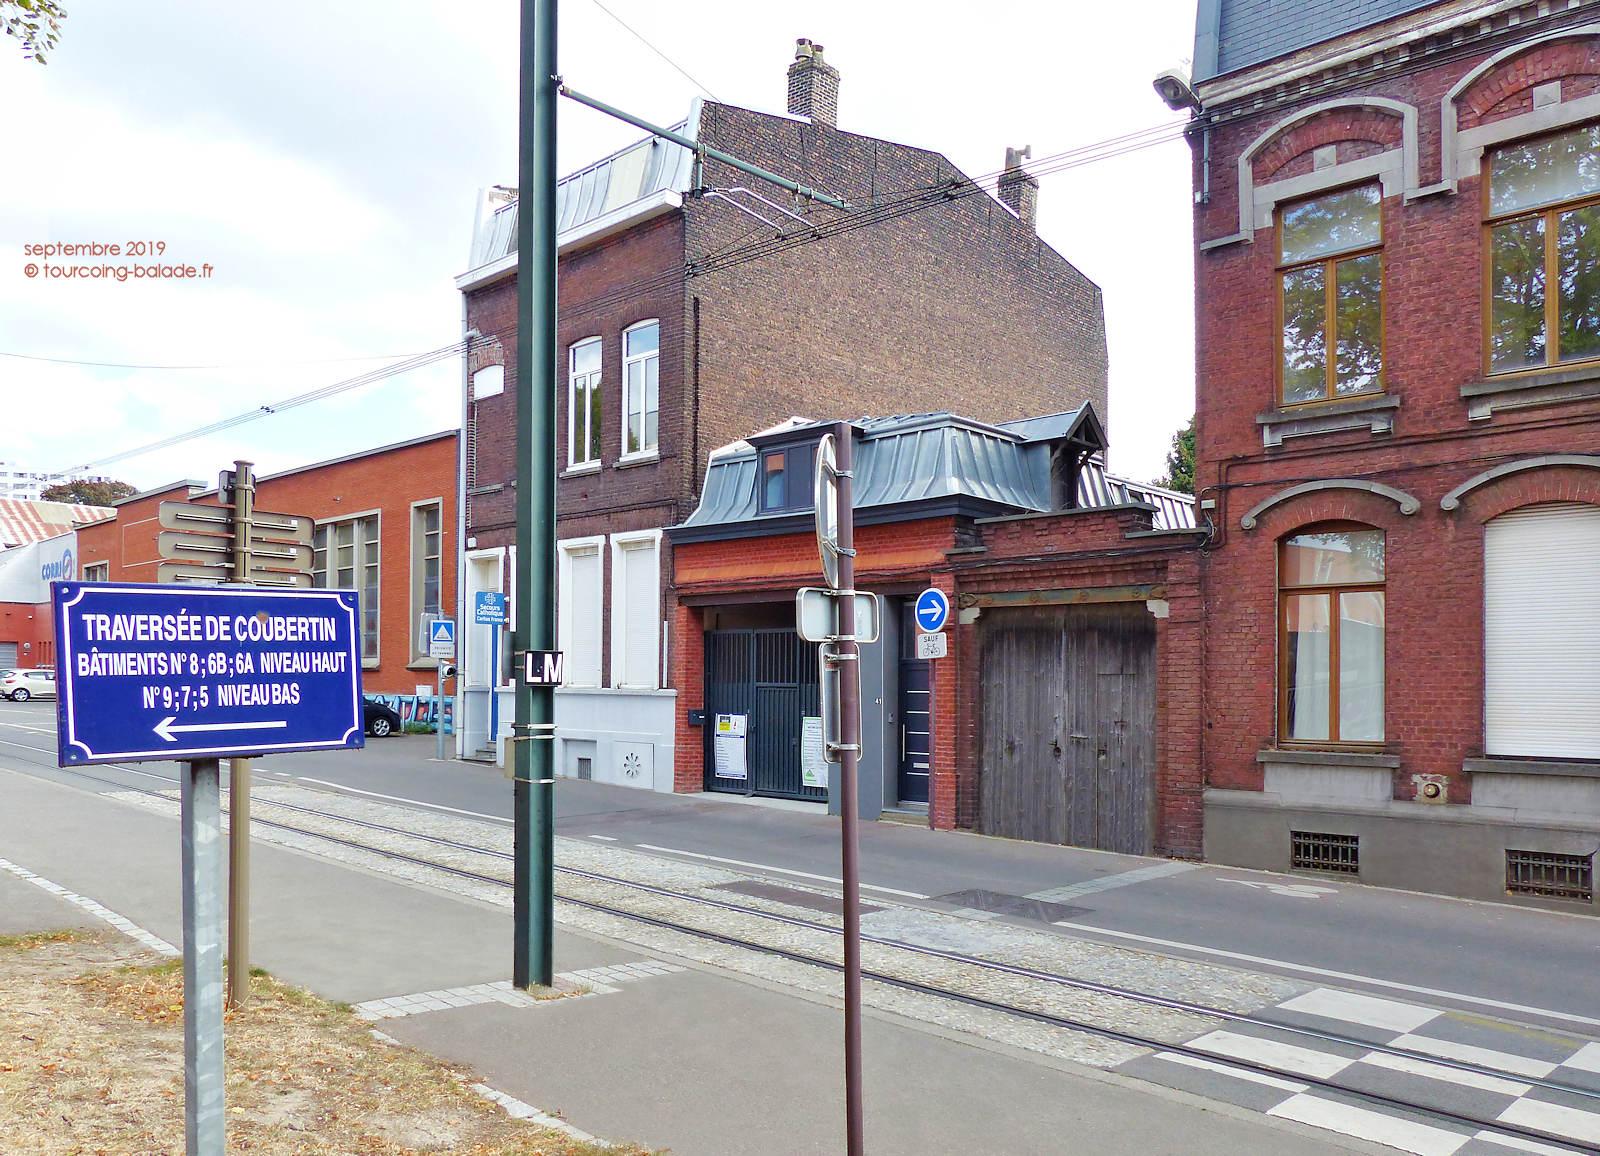 Tourcoing - Rue Chanzy et Traverse de Coubertin.